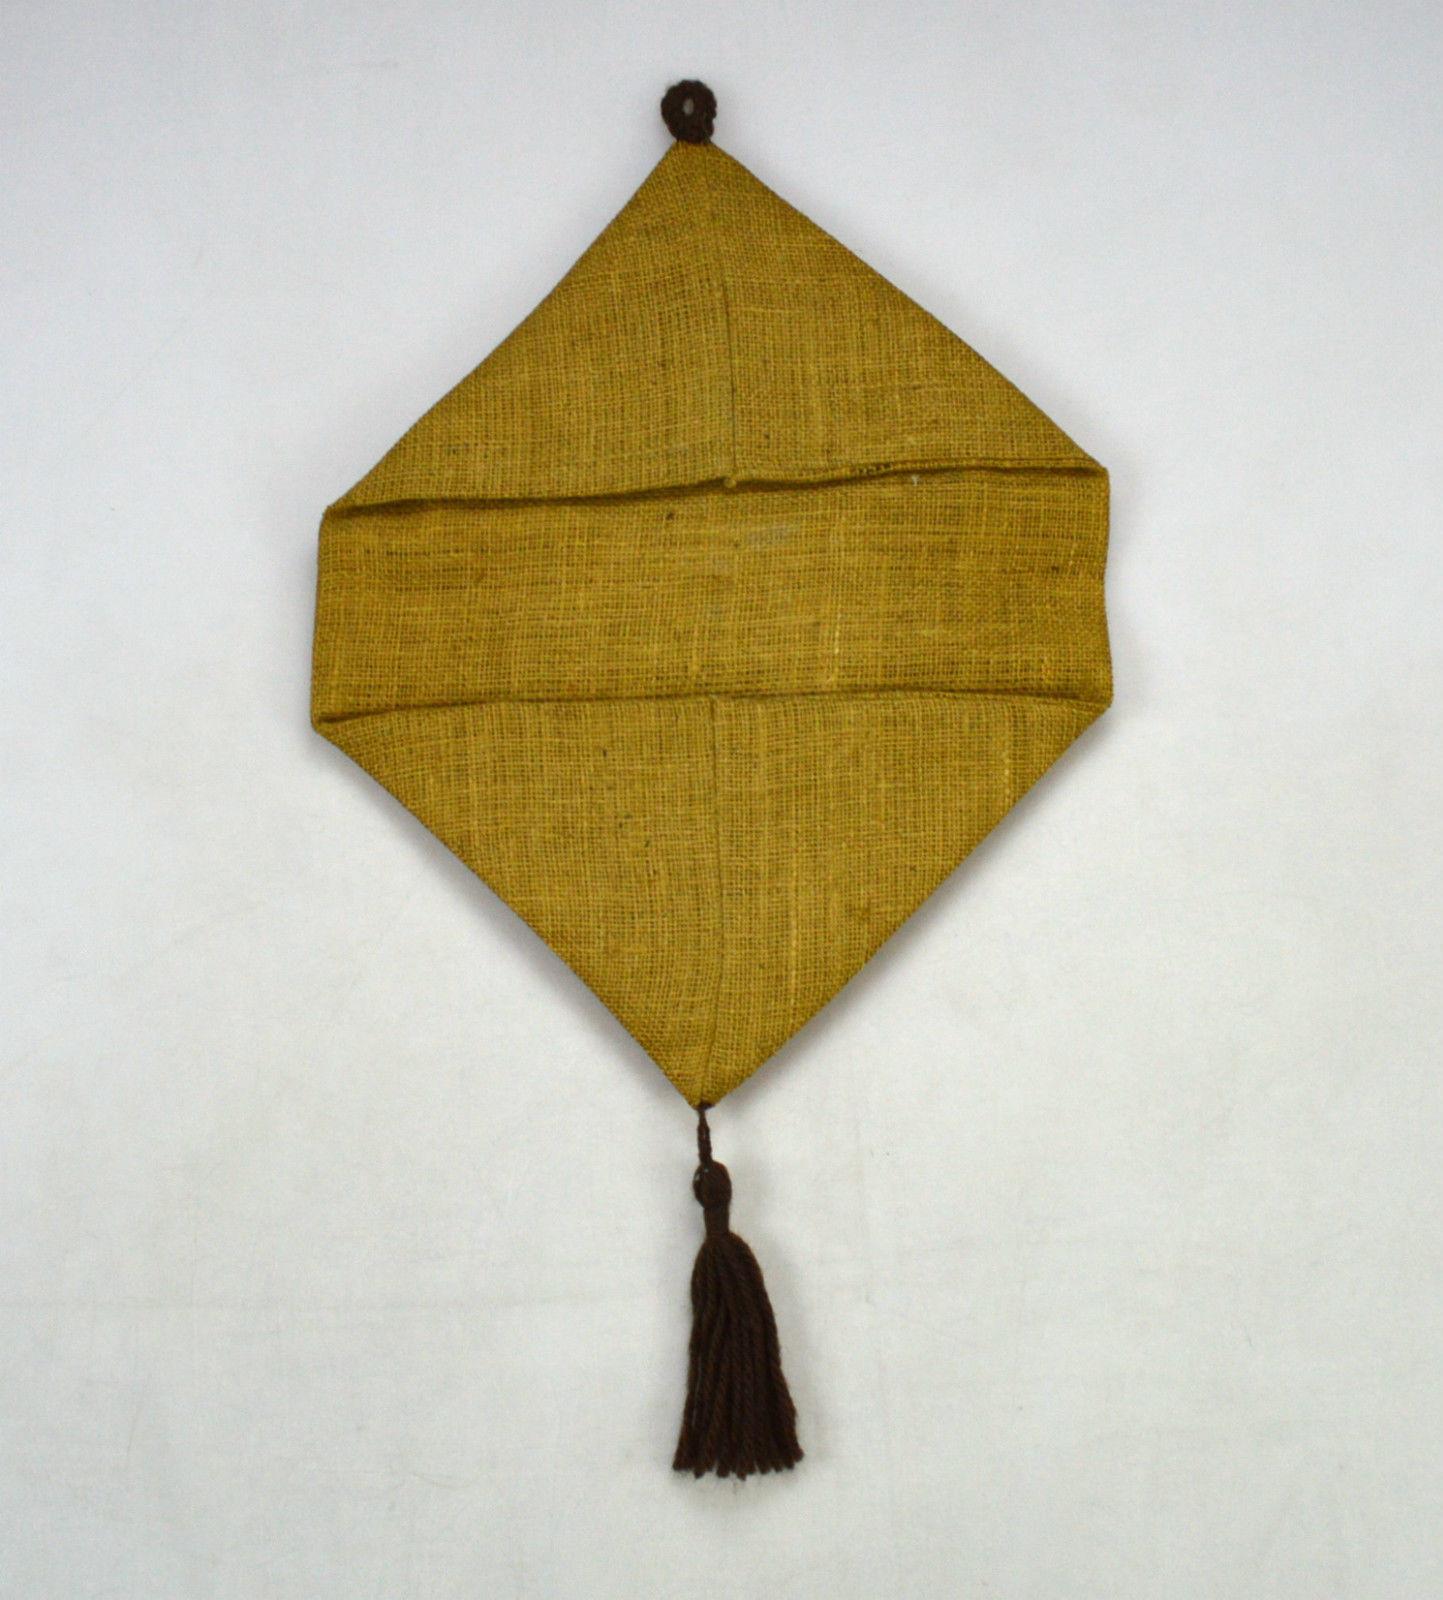 Vintage Owl Rug Knot Knit Plush Tapestry Burlap Outsider Primitive Wall Hang Art